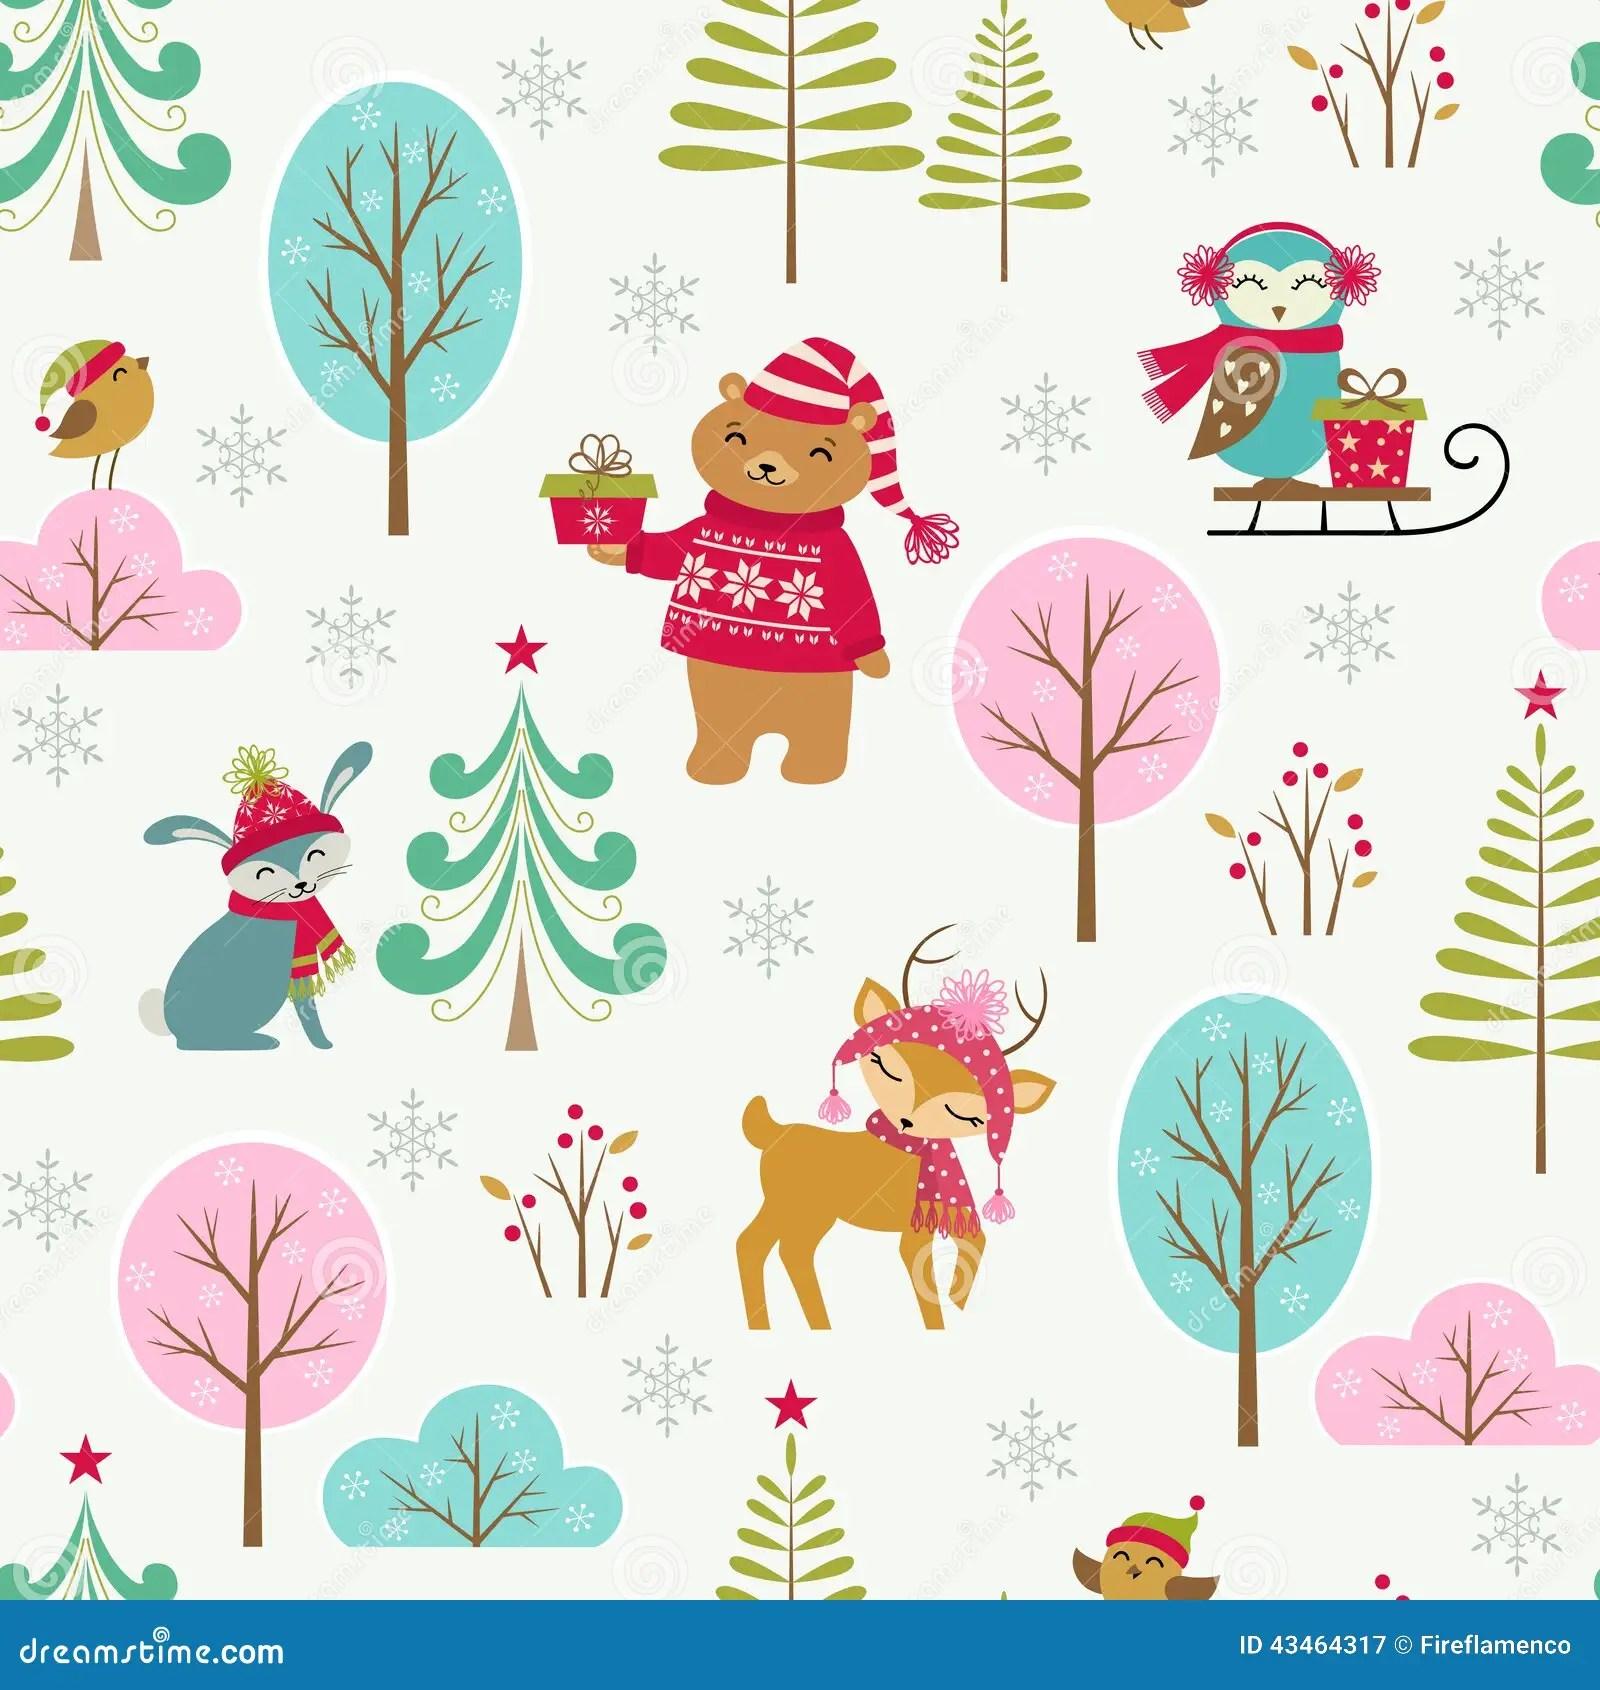 Cute Owl Cartoon Wallpaper Cute Christmas Forest Pattern Stock Vector Image 43464317